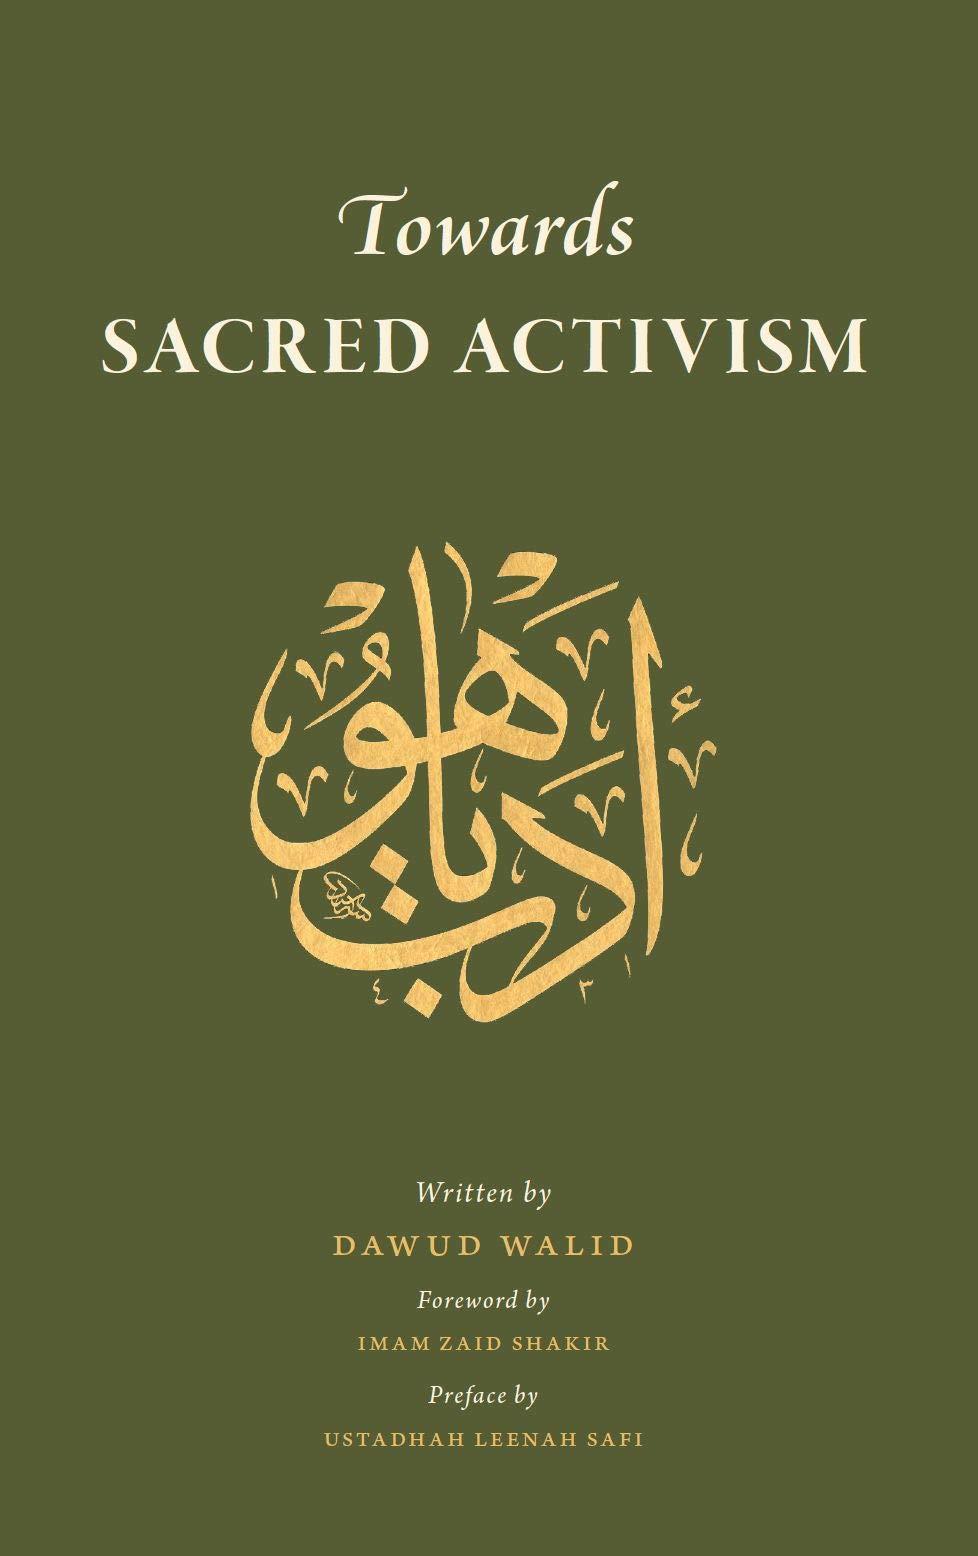 Towards Sacred Activism: Dawud Walid: 9781732258815: Amazon.com: Books